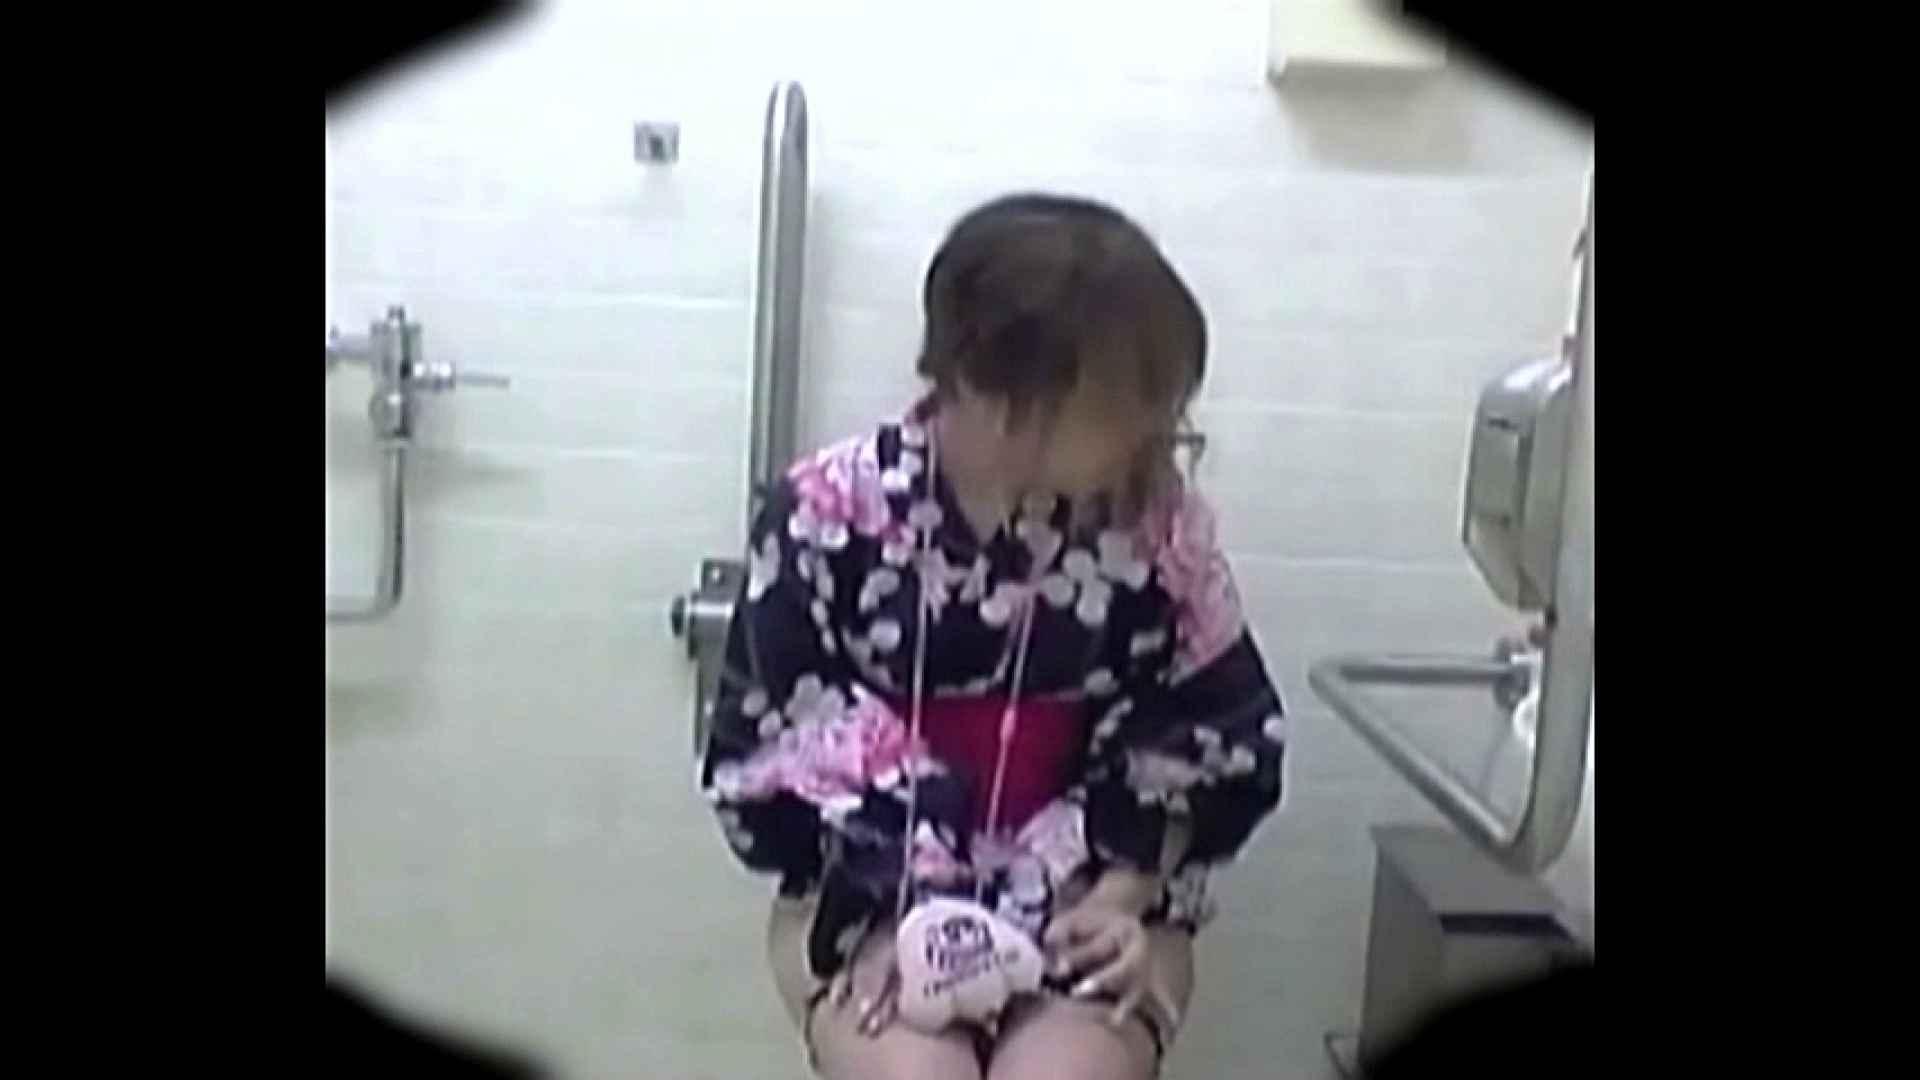 teen galトイレ覗き紙がナイ編‼vol.01 覗き ぱこり動画紹介 93pic 39